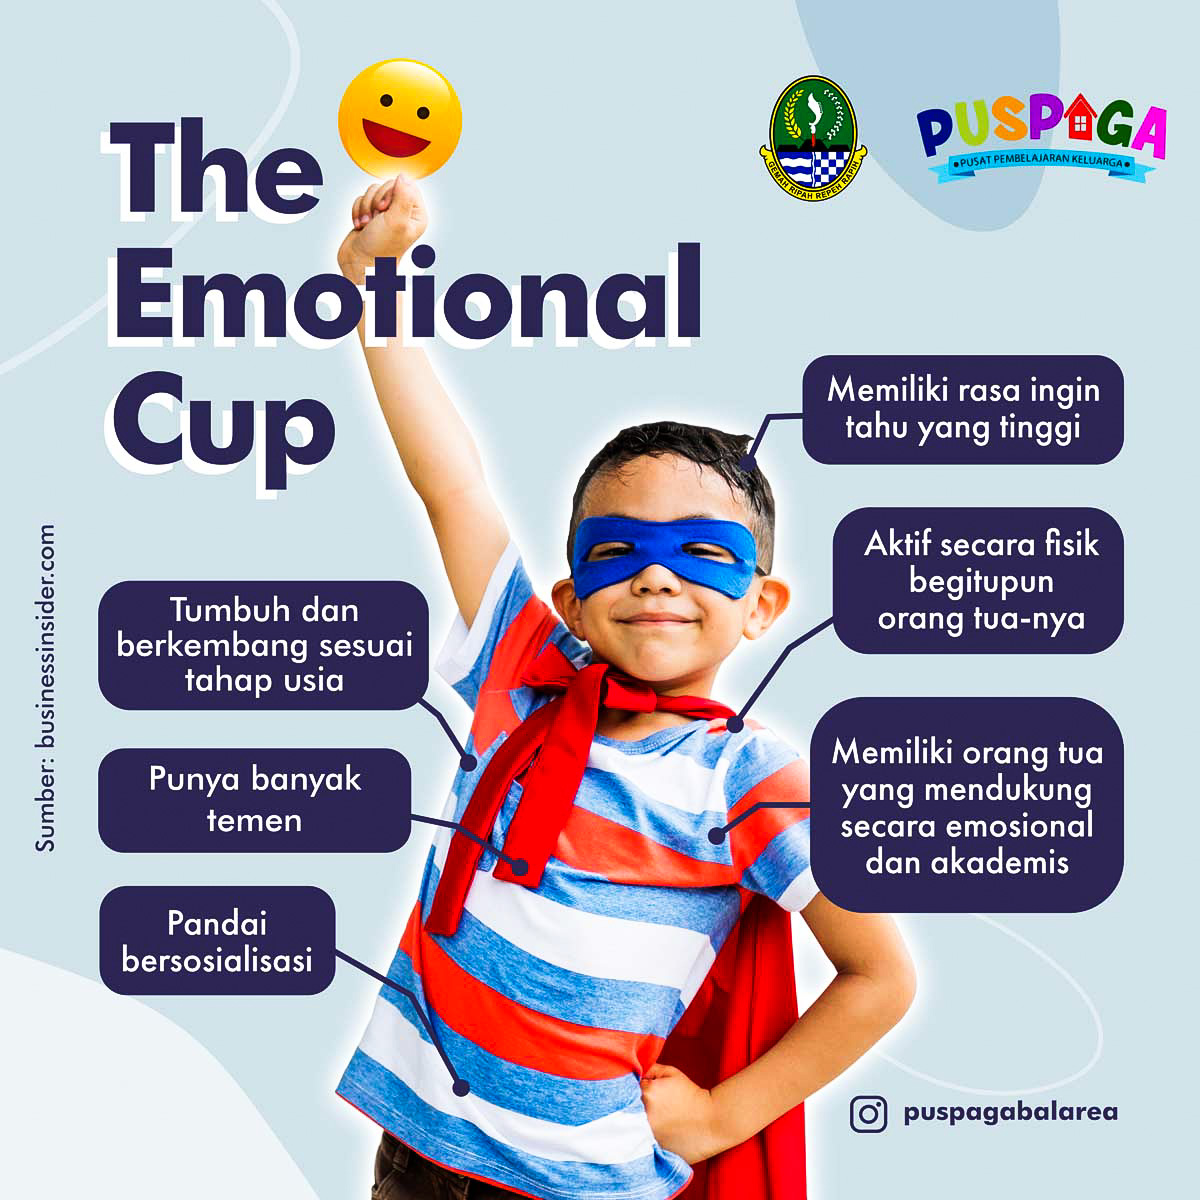 puspaga-2_edited